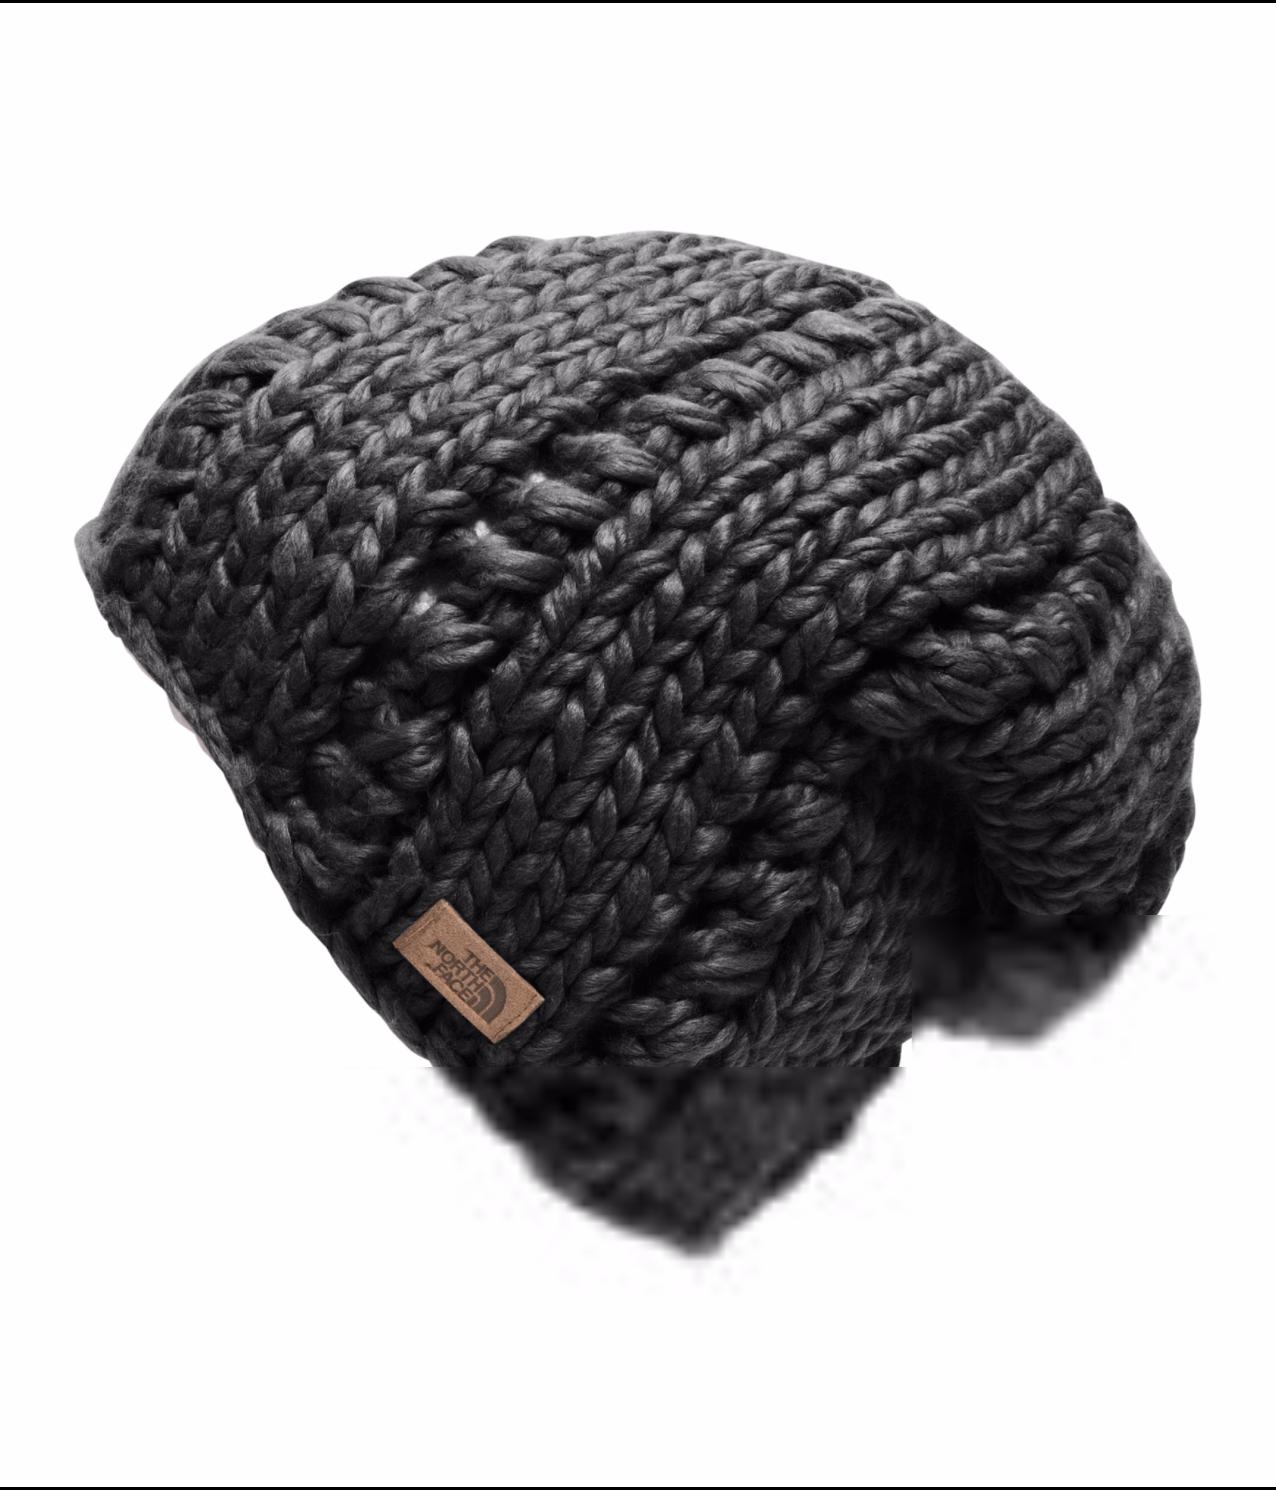 2016/17 TNF Chunky Knit Beanie TNF BLACK